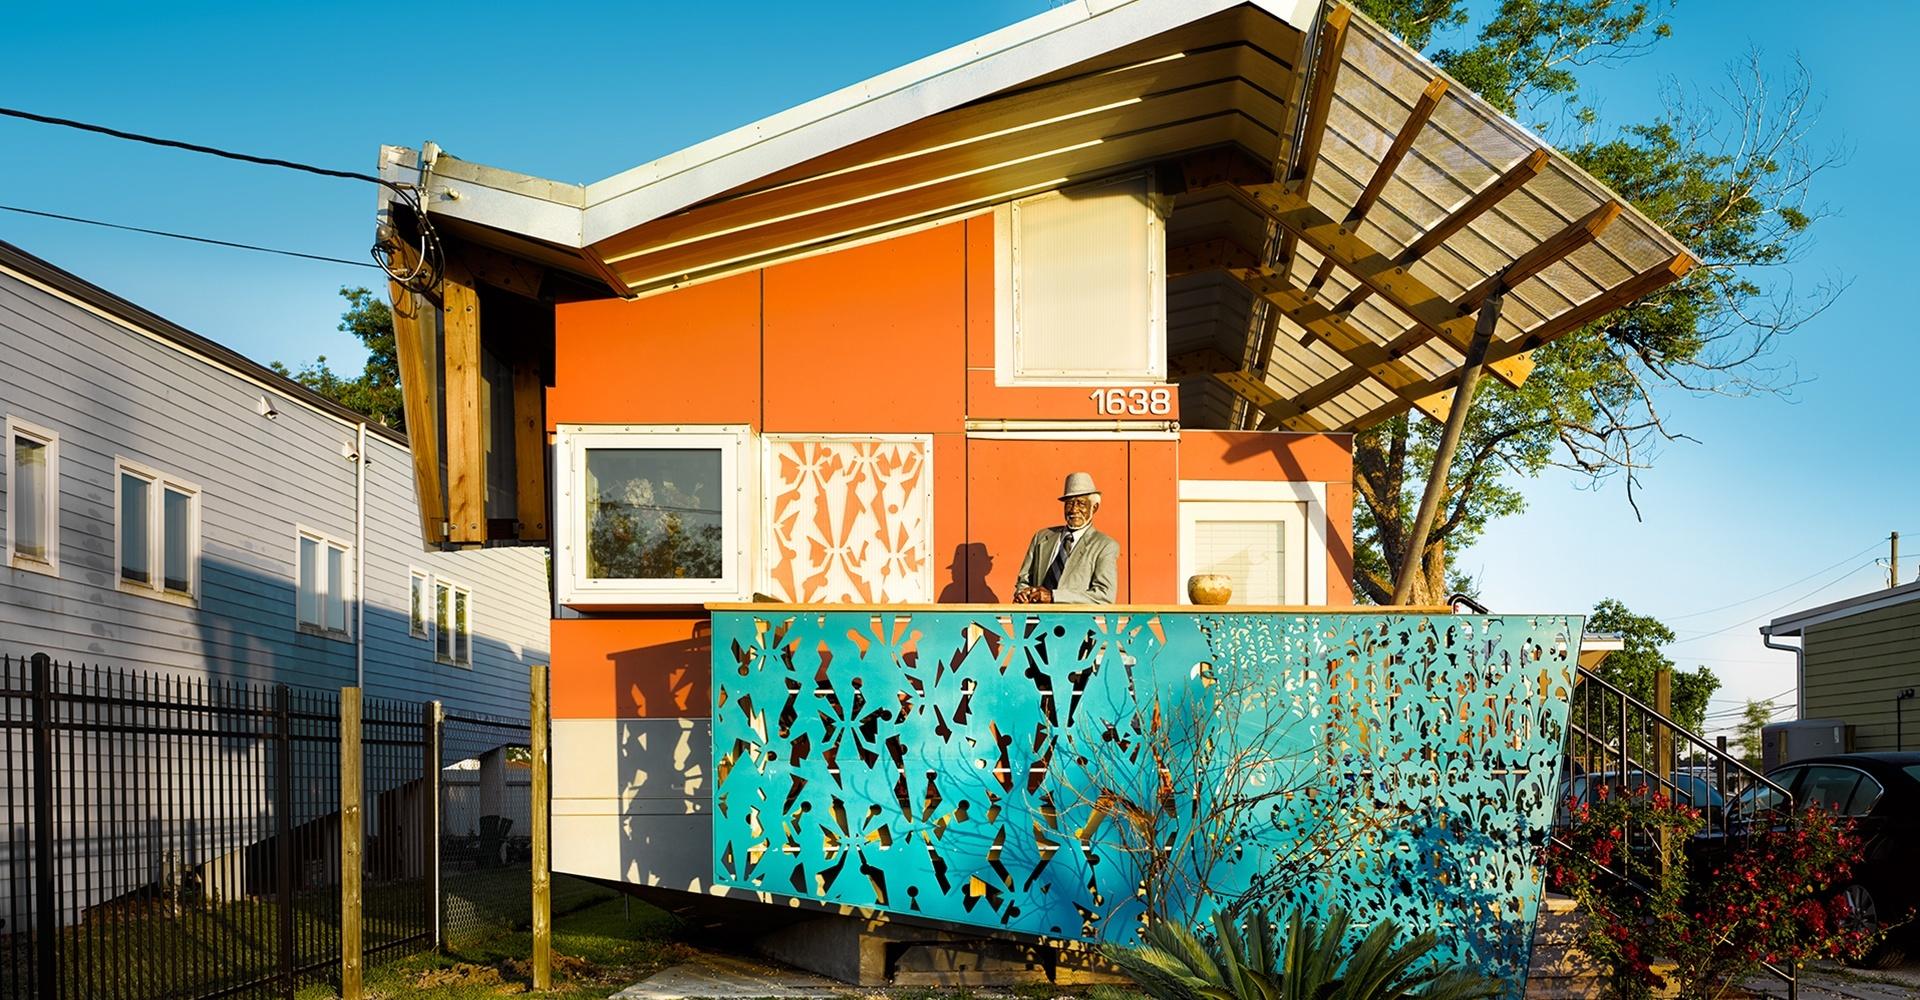 A house on stilts - New Orleans, LA